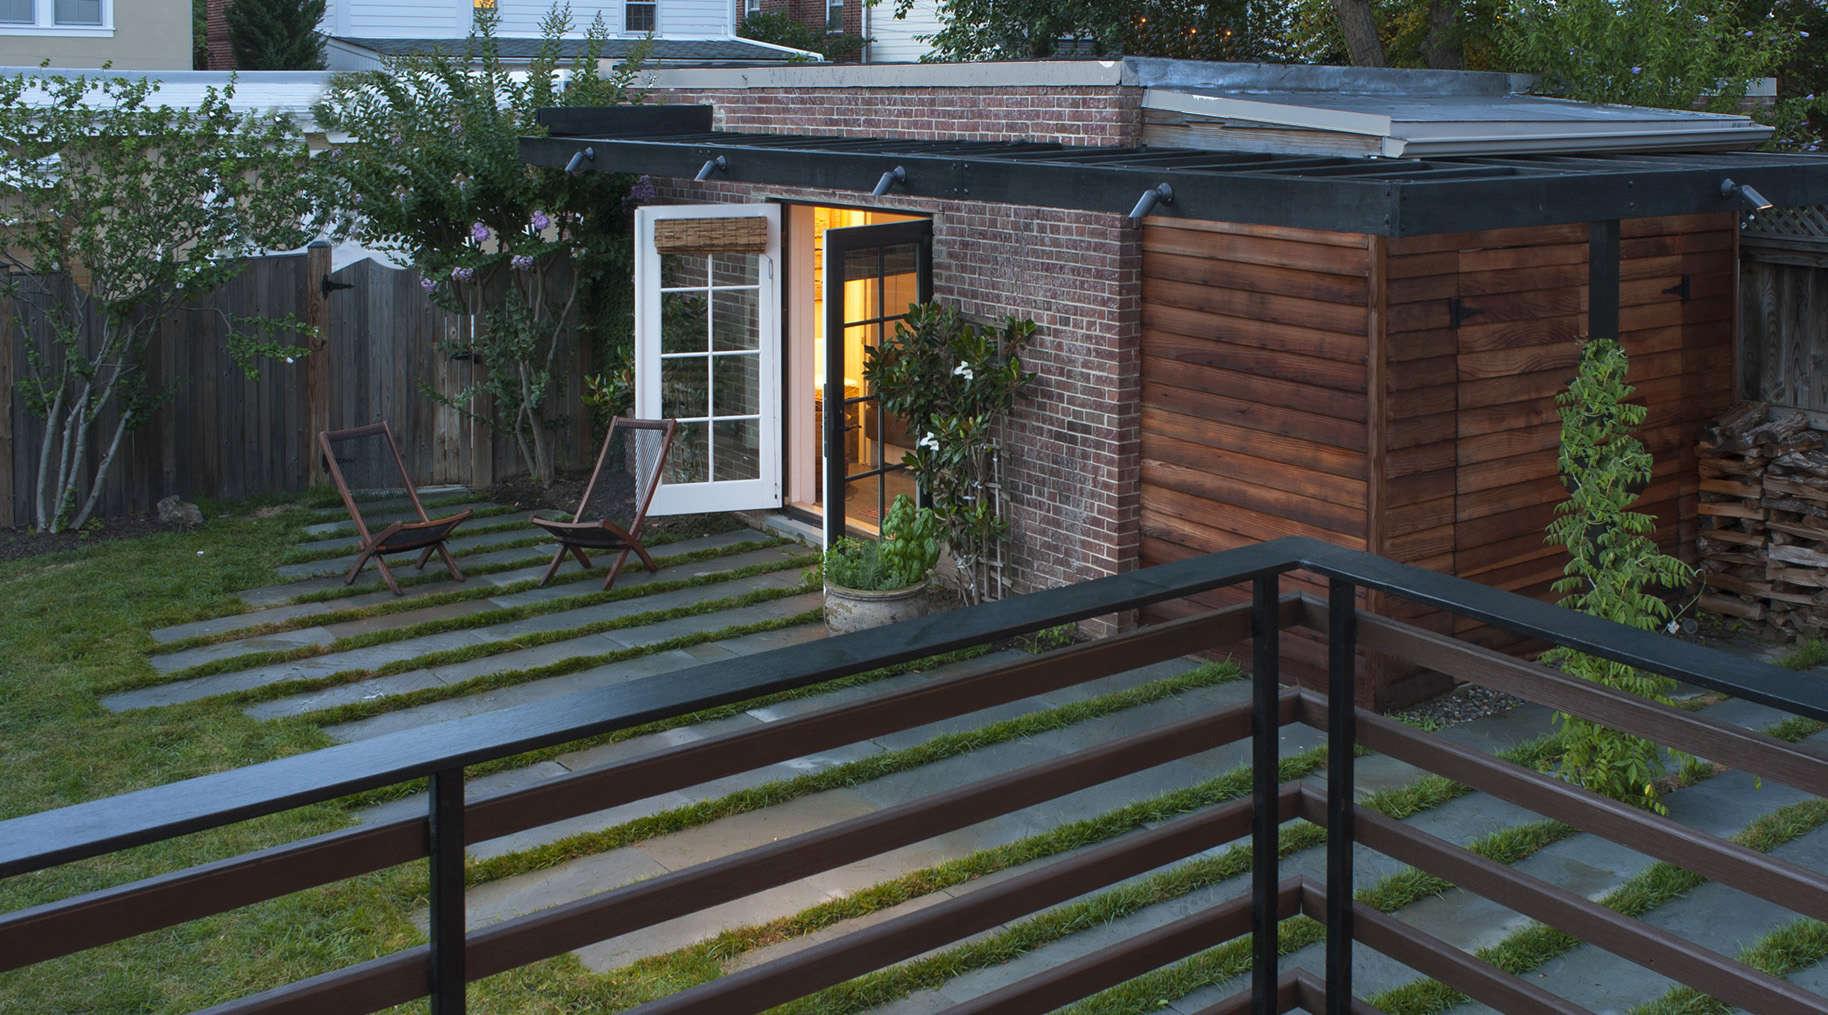 Guest Cabana by Fowlkes Studio | Gardenista